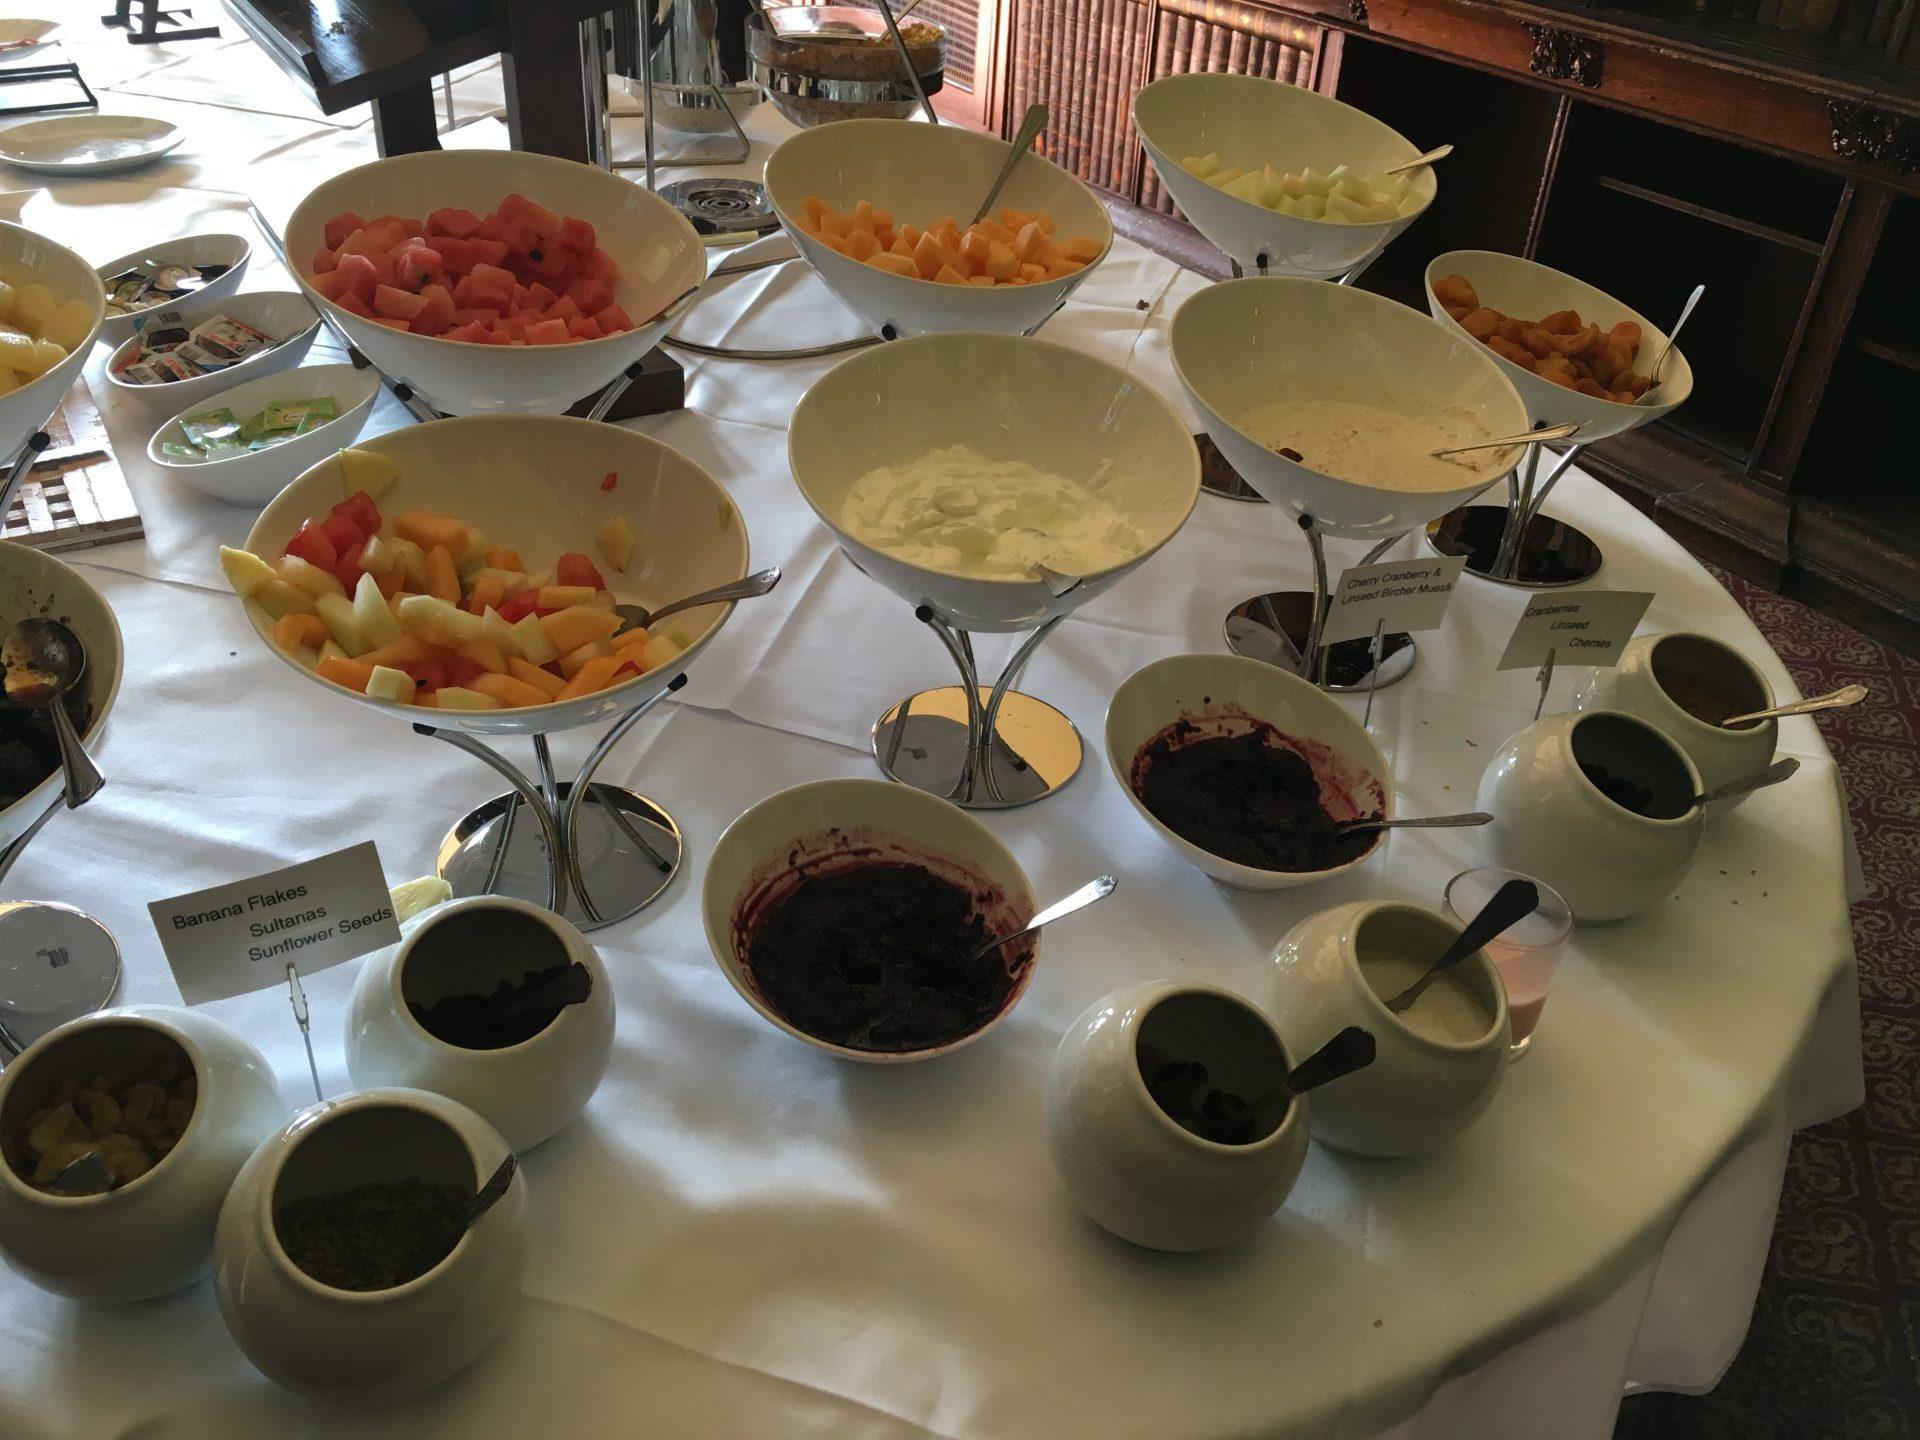 Ettington Park hotel breakfast in the library